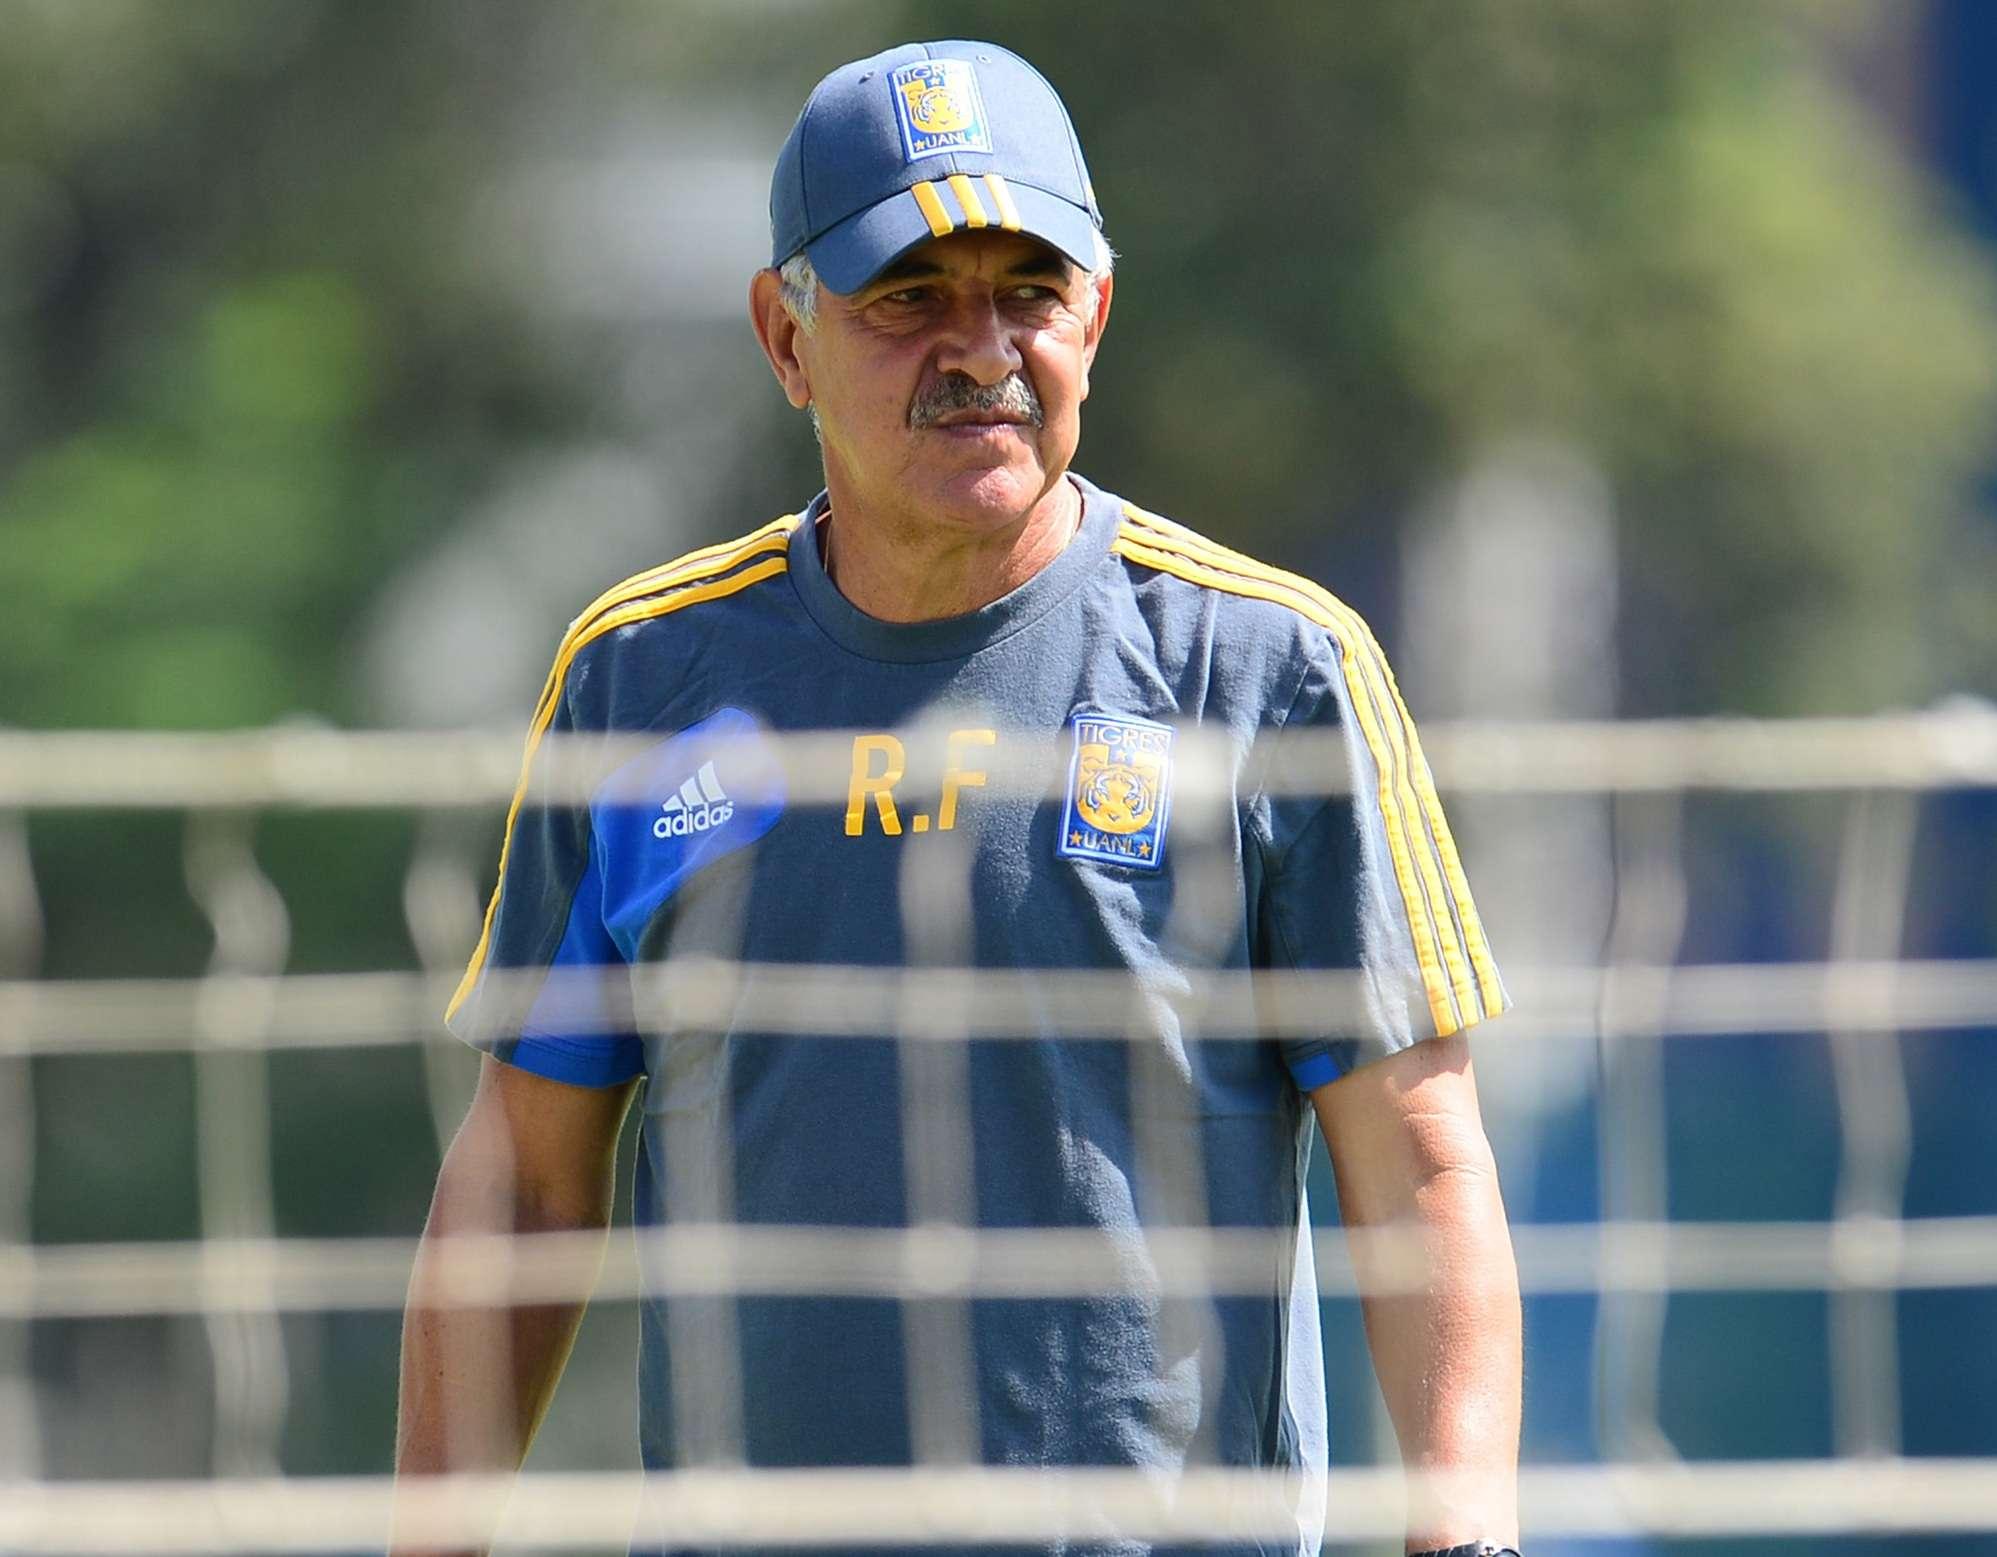 Ricardo Ferretti suma 16 torneos cortos como técnico de Tigres, en tres etapas distintas. Foto: Mexsport